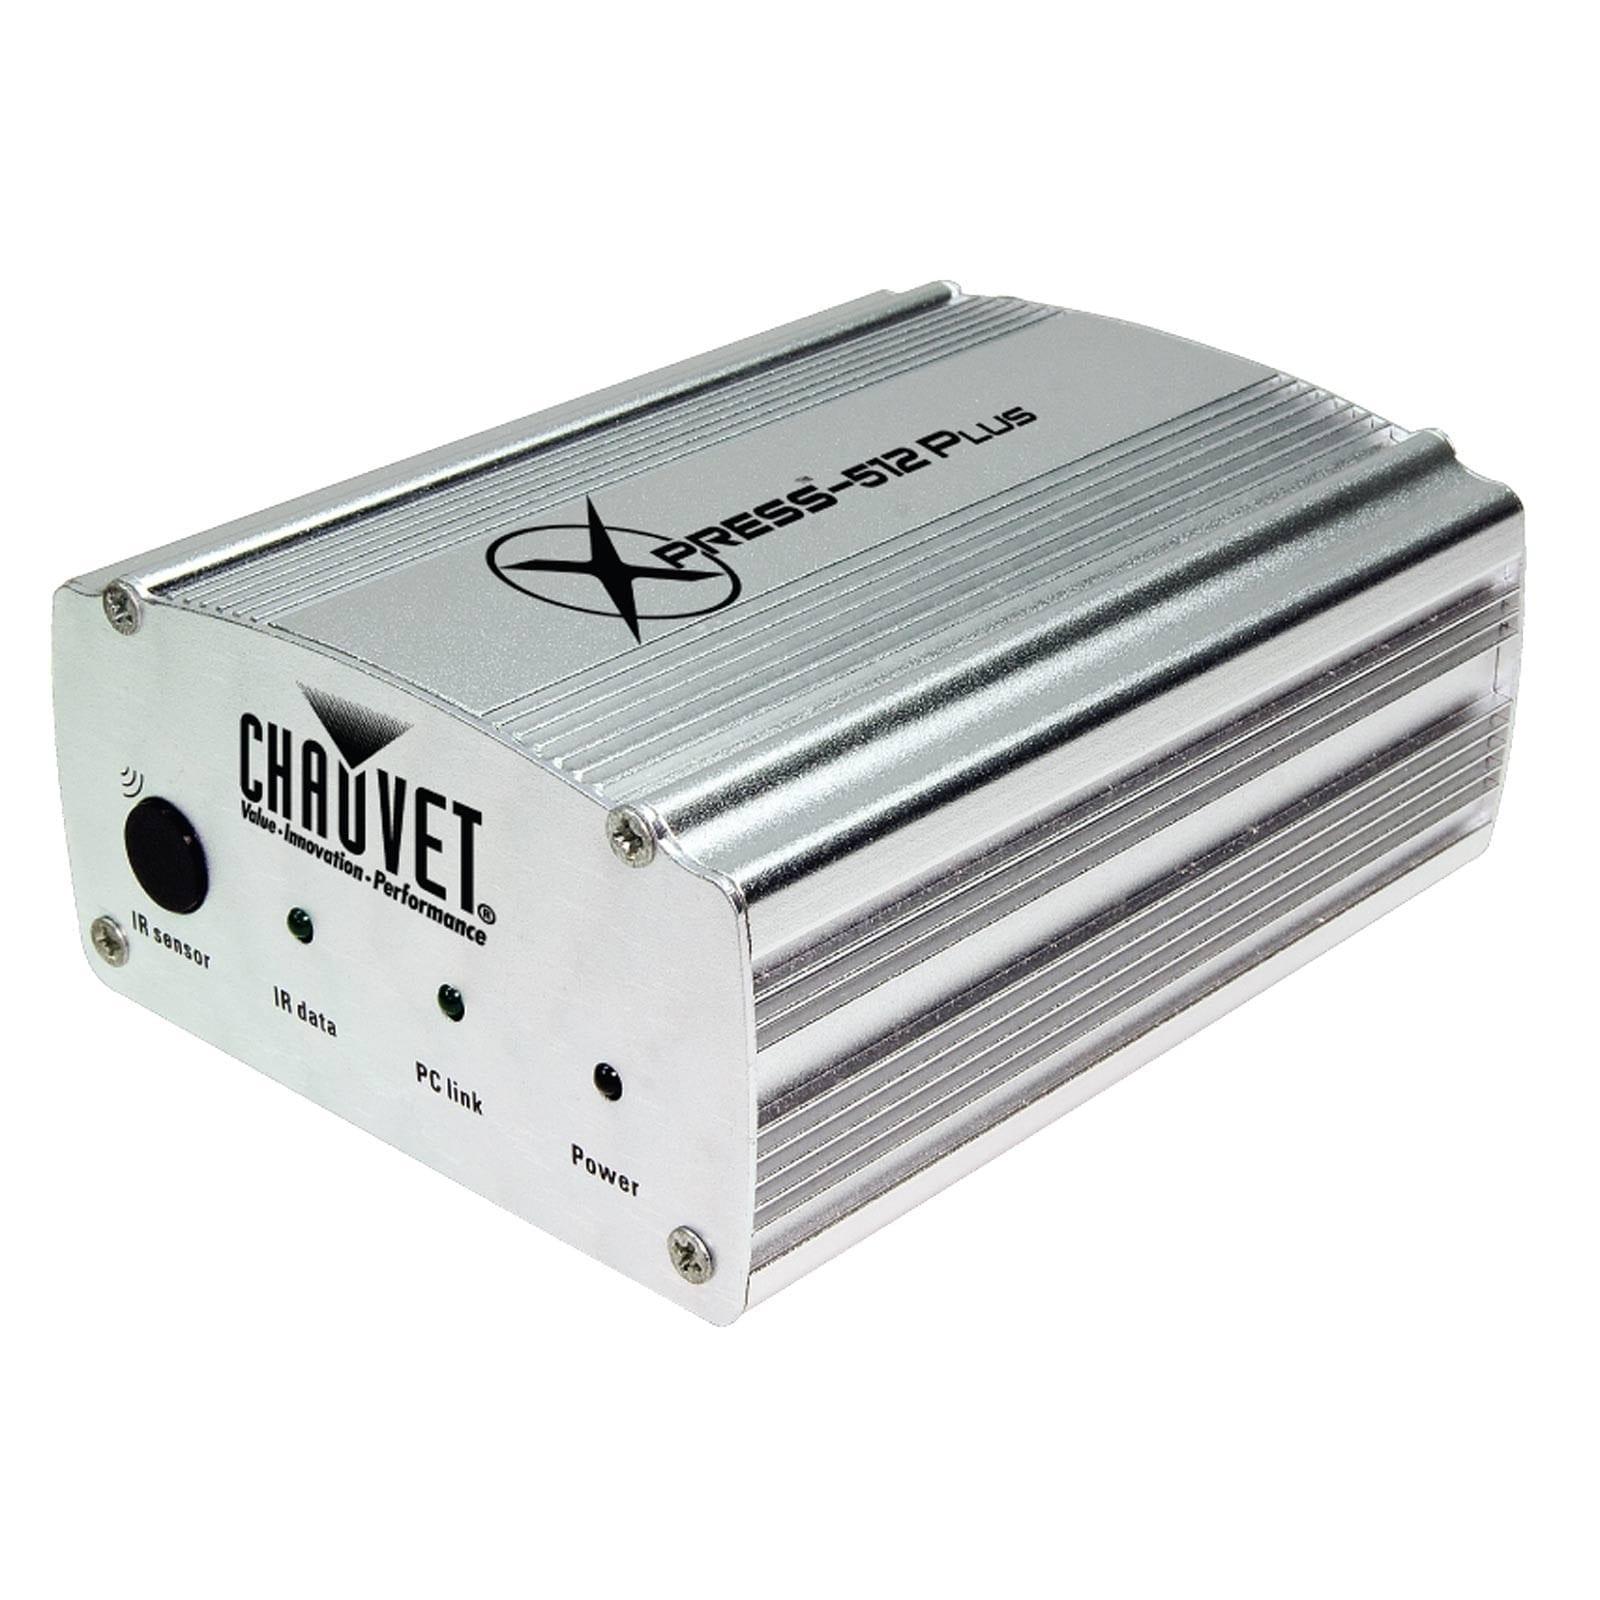 chauvet-dj-xpress-512-plus-dmx-512-usb-interface-for-showxpress-software-afb